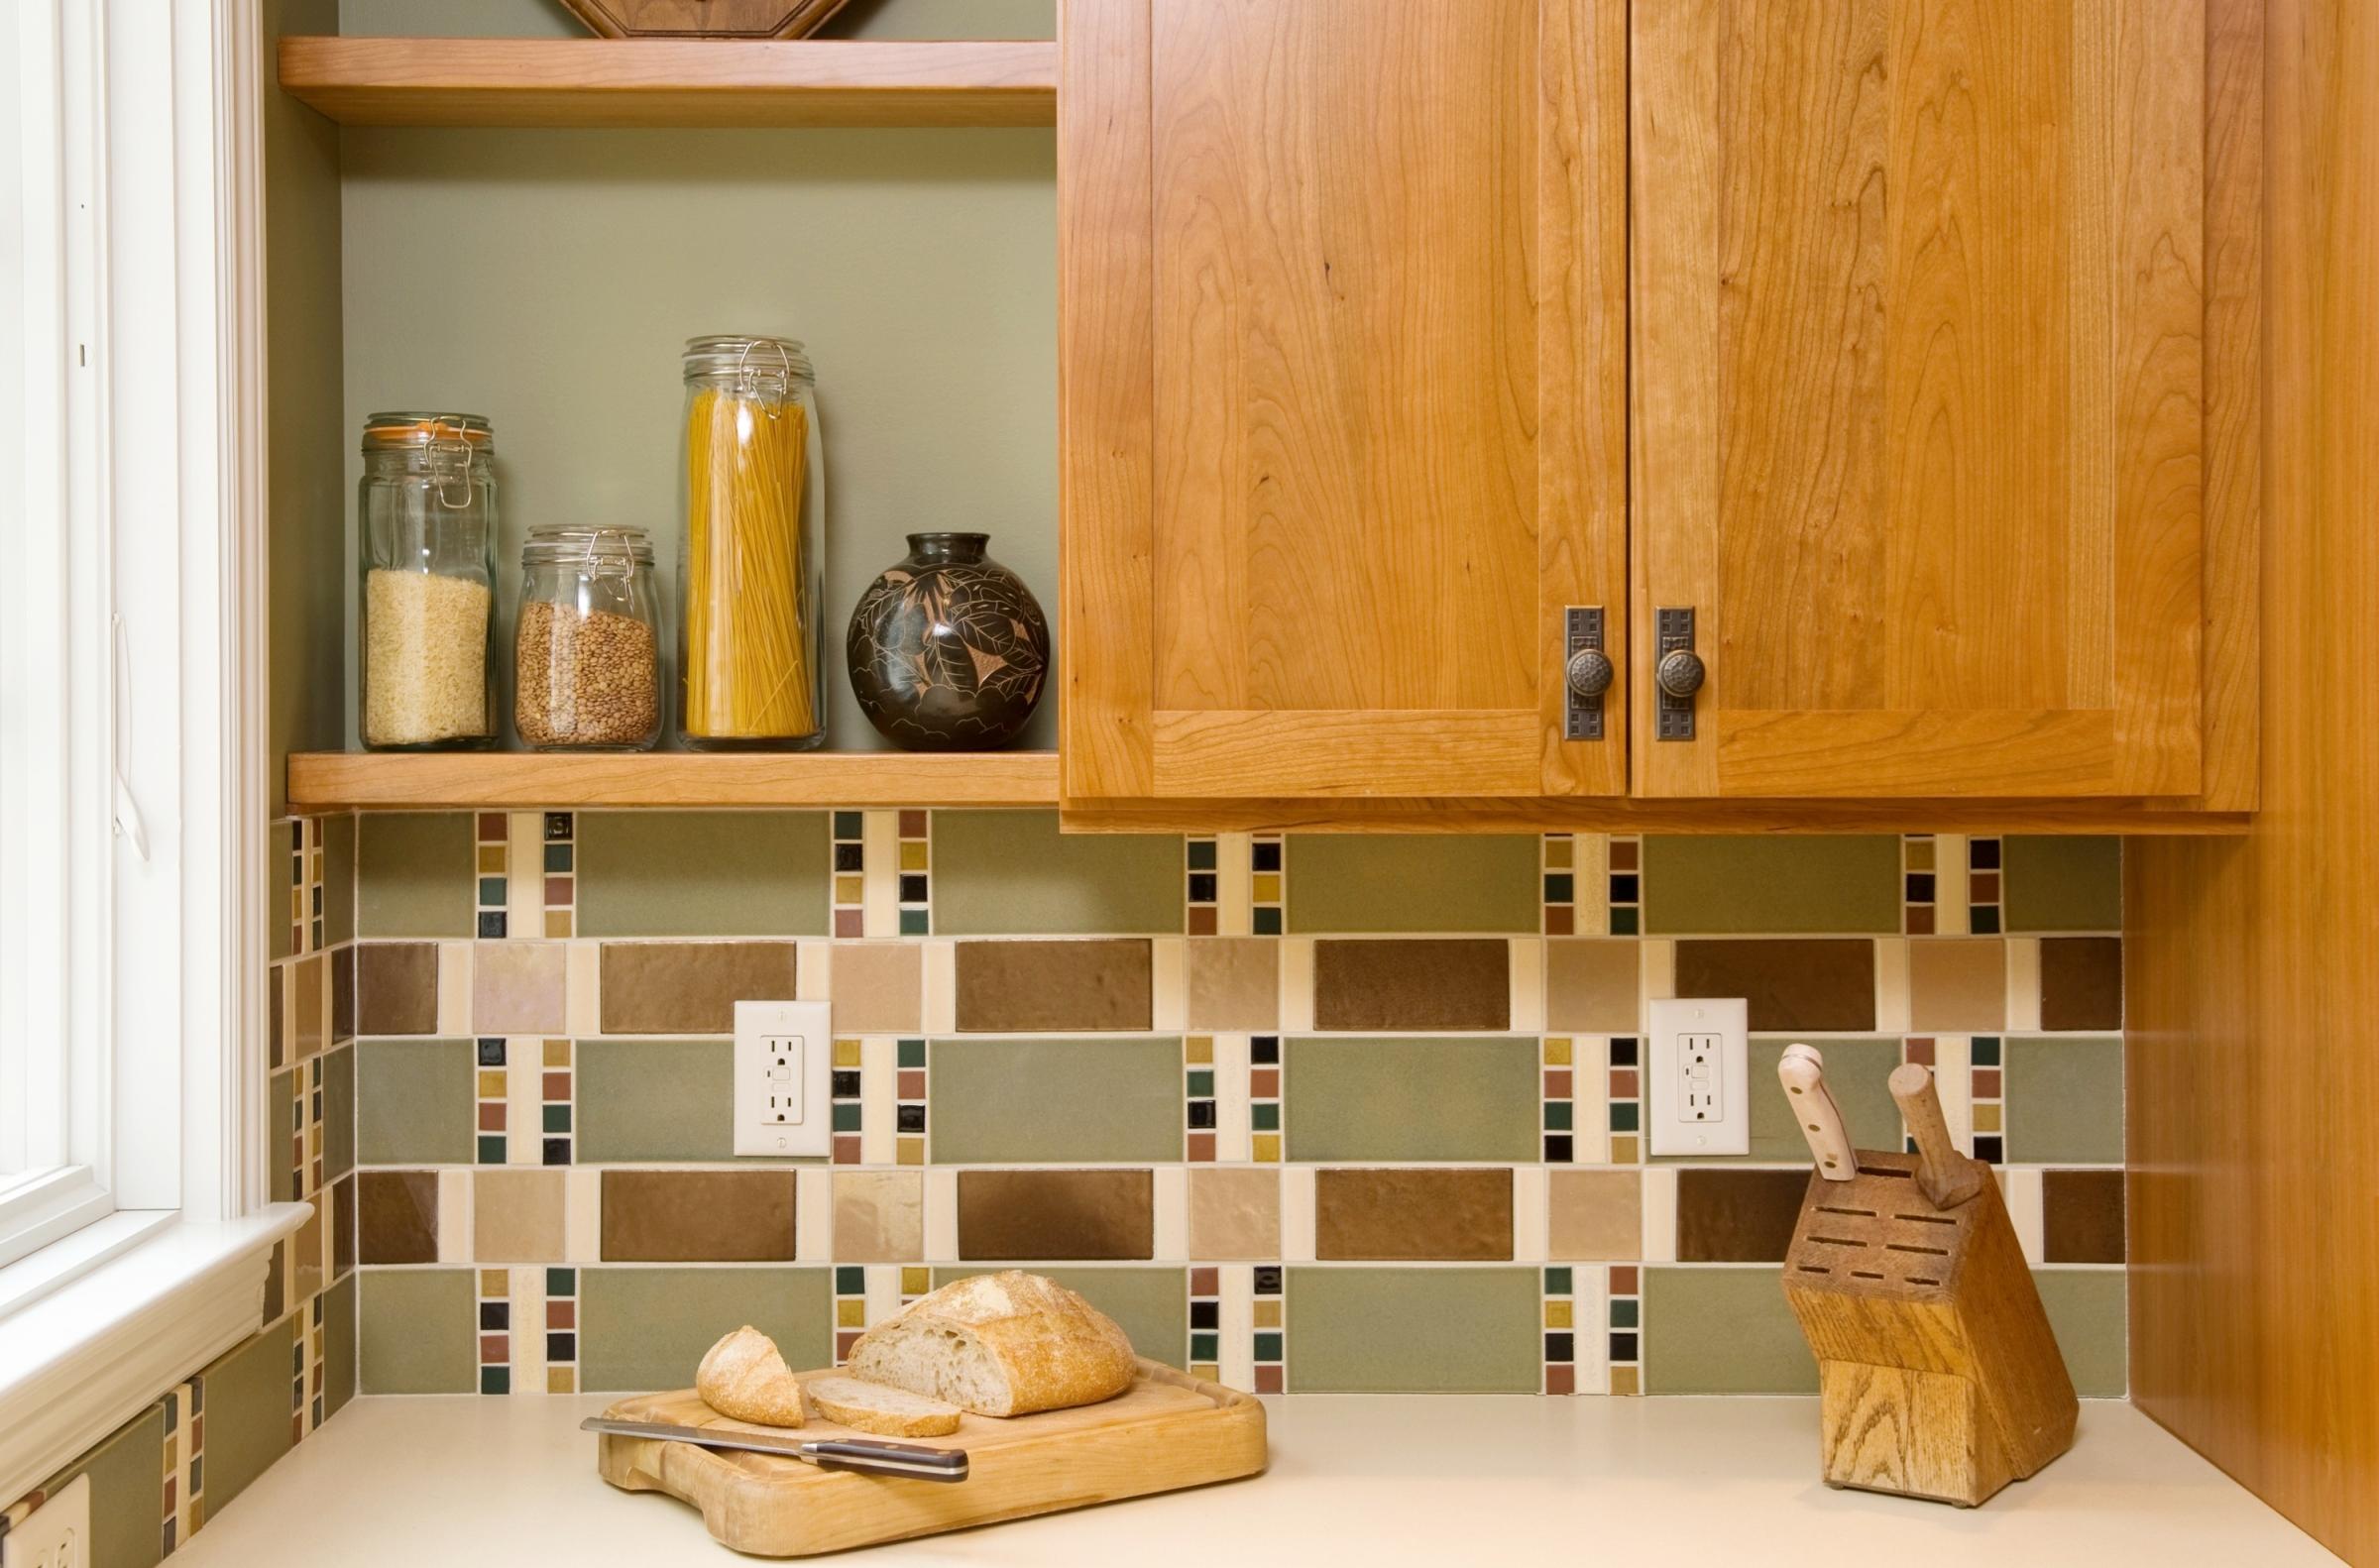 Kitchens_37.jpg